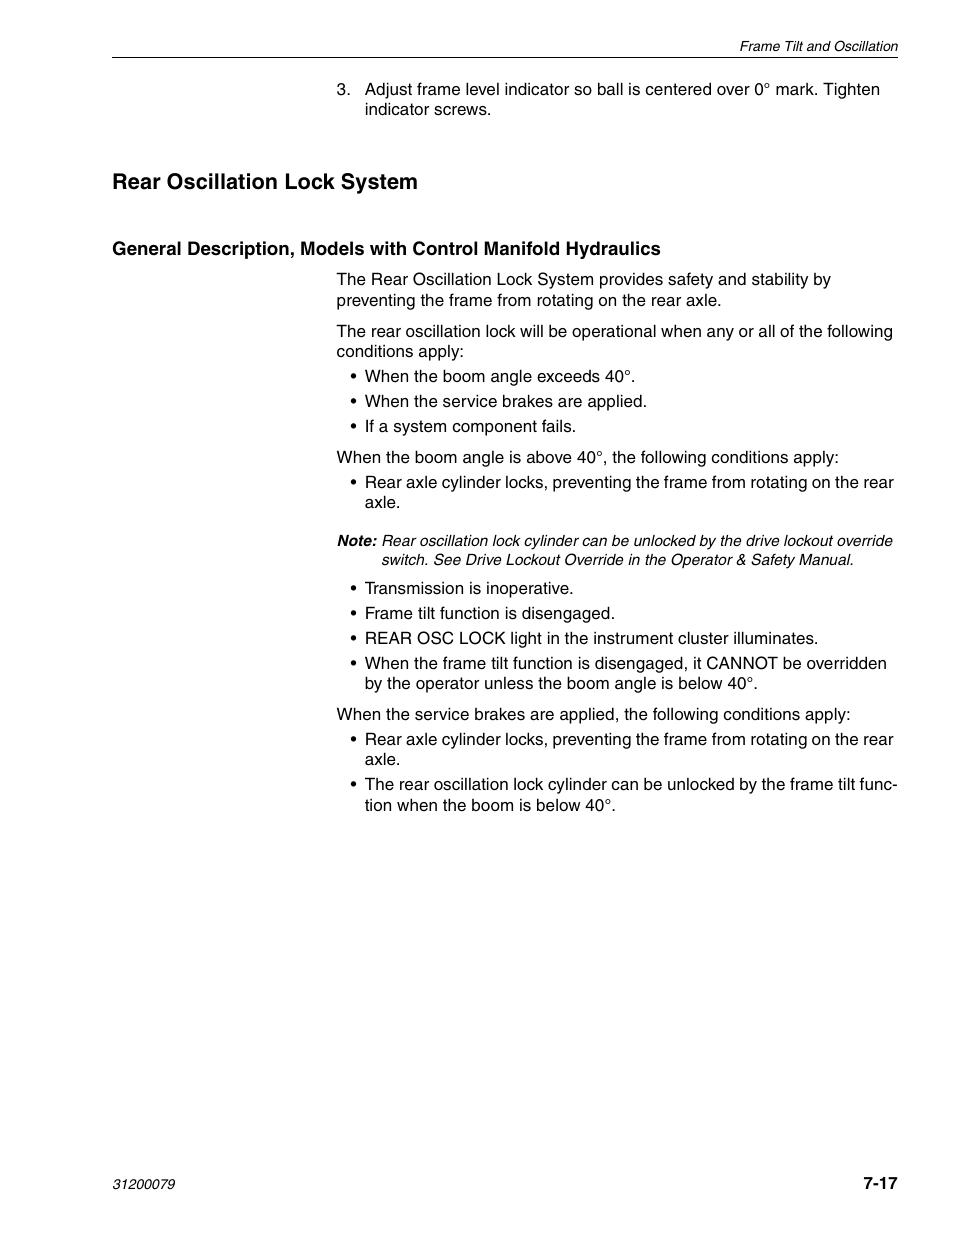 Lull 1044c-54 series ii service manual user manual | page 208.